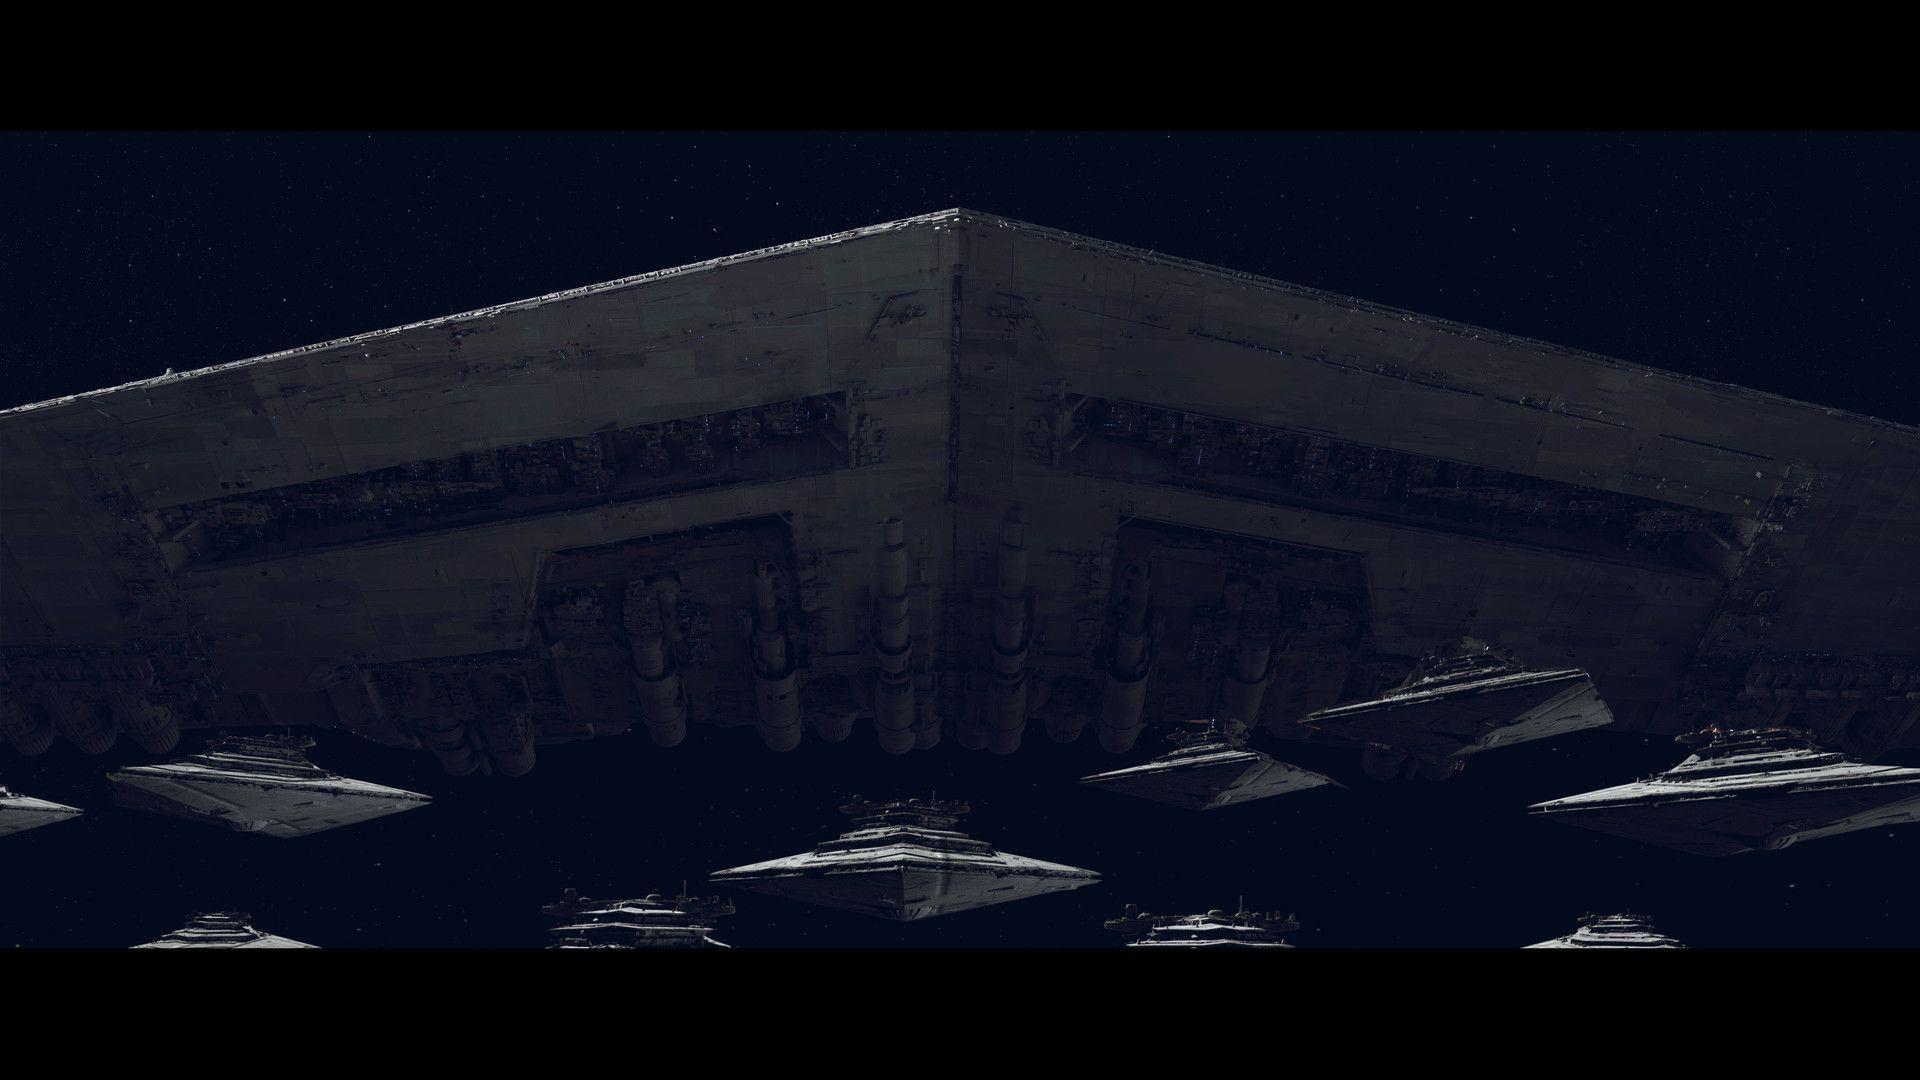 Star Wars The Last Jedi Supremacy Underside Star Wars Ships Star Wars Spaceships Star Wars Empire